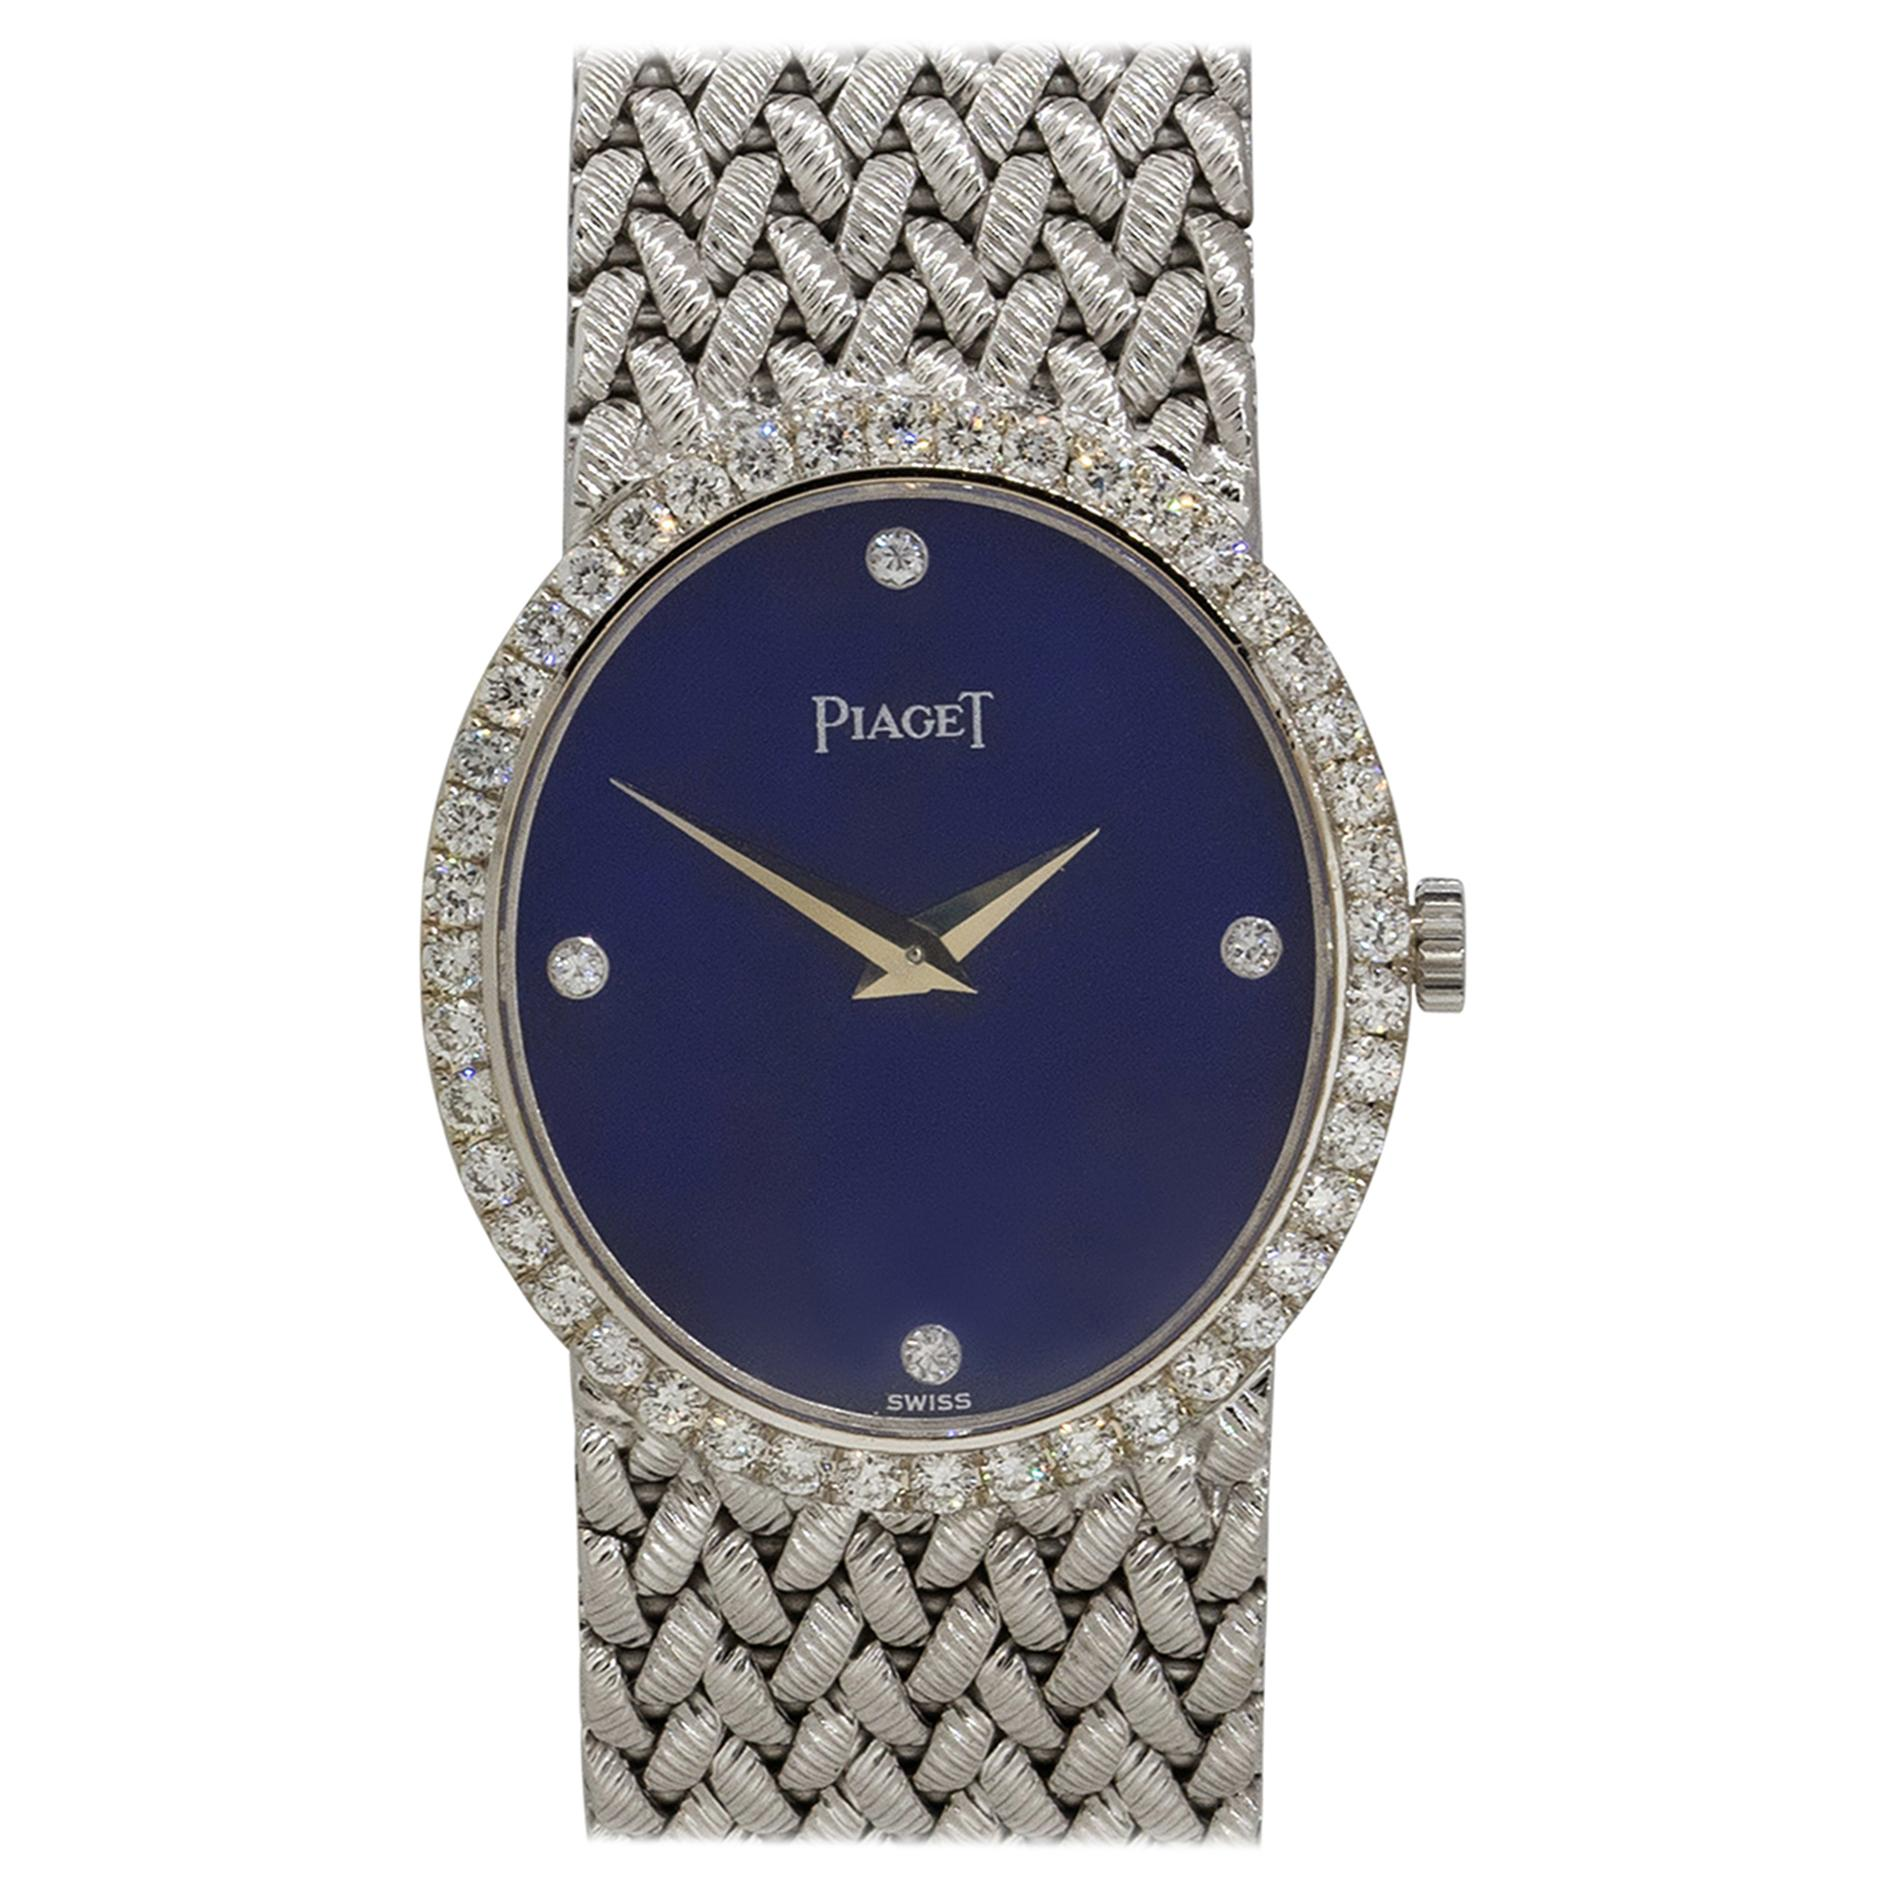 Piaget 9821D3 18k White Gold Lapis Diamond Dial Ladies Watch